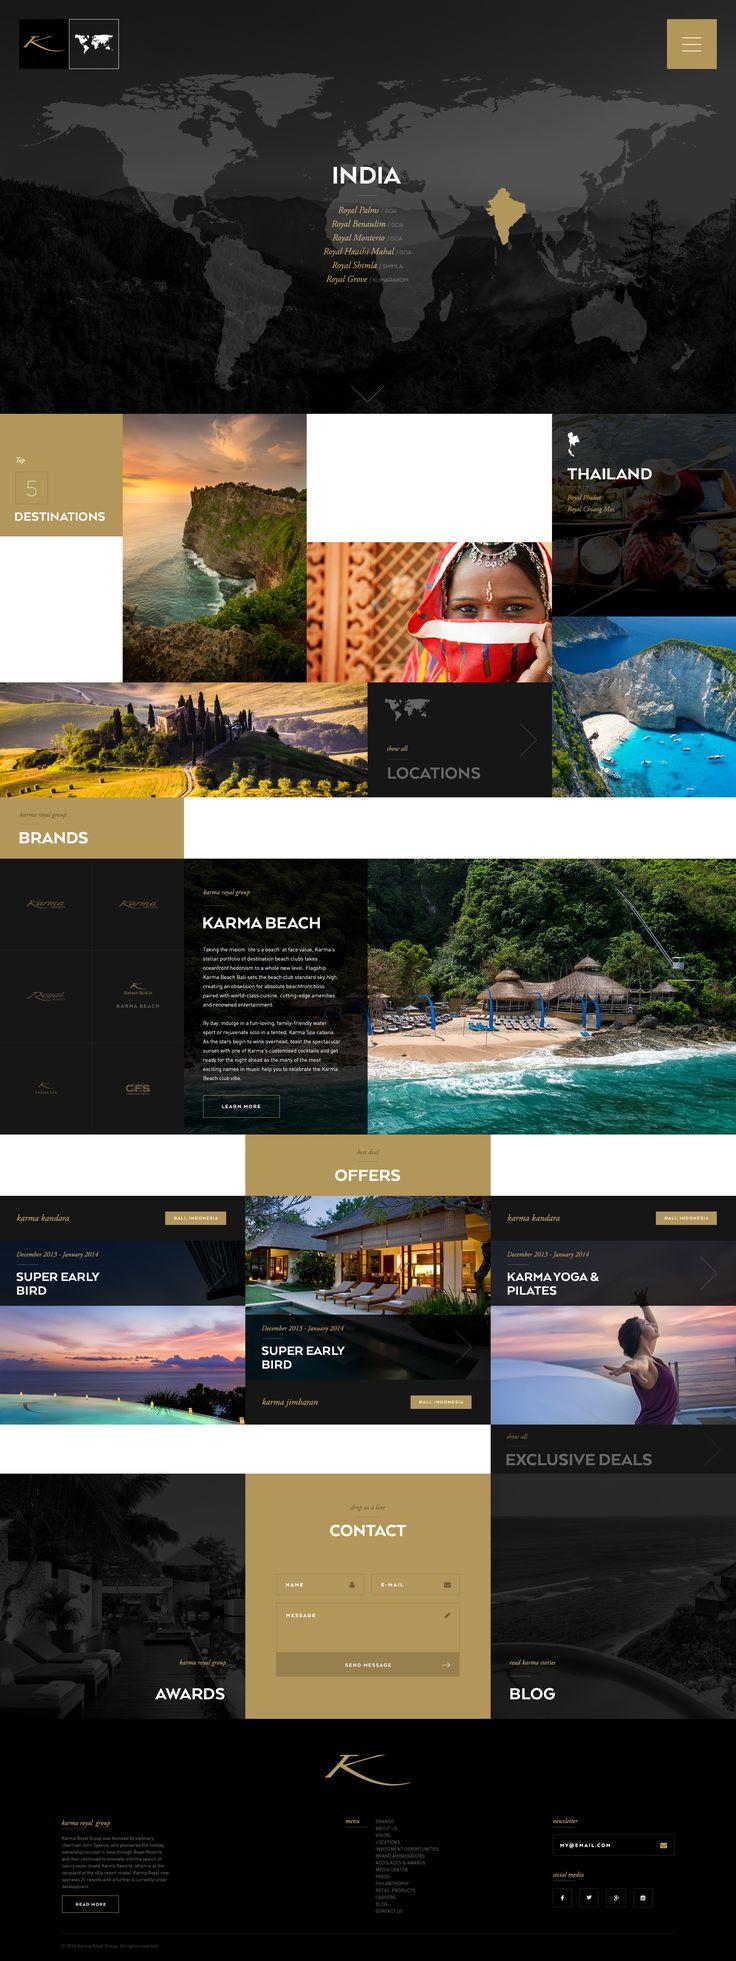 Dribbble - KRG-homepage.jpg by Soňa Psotová